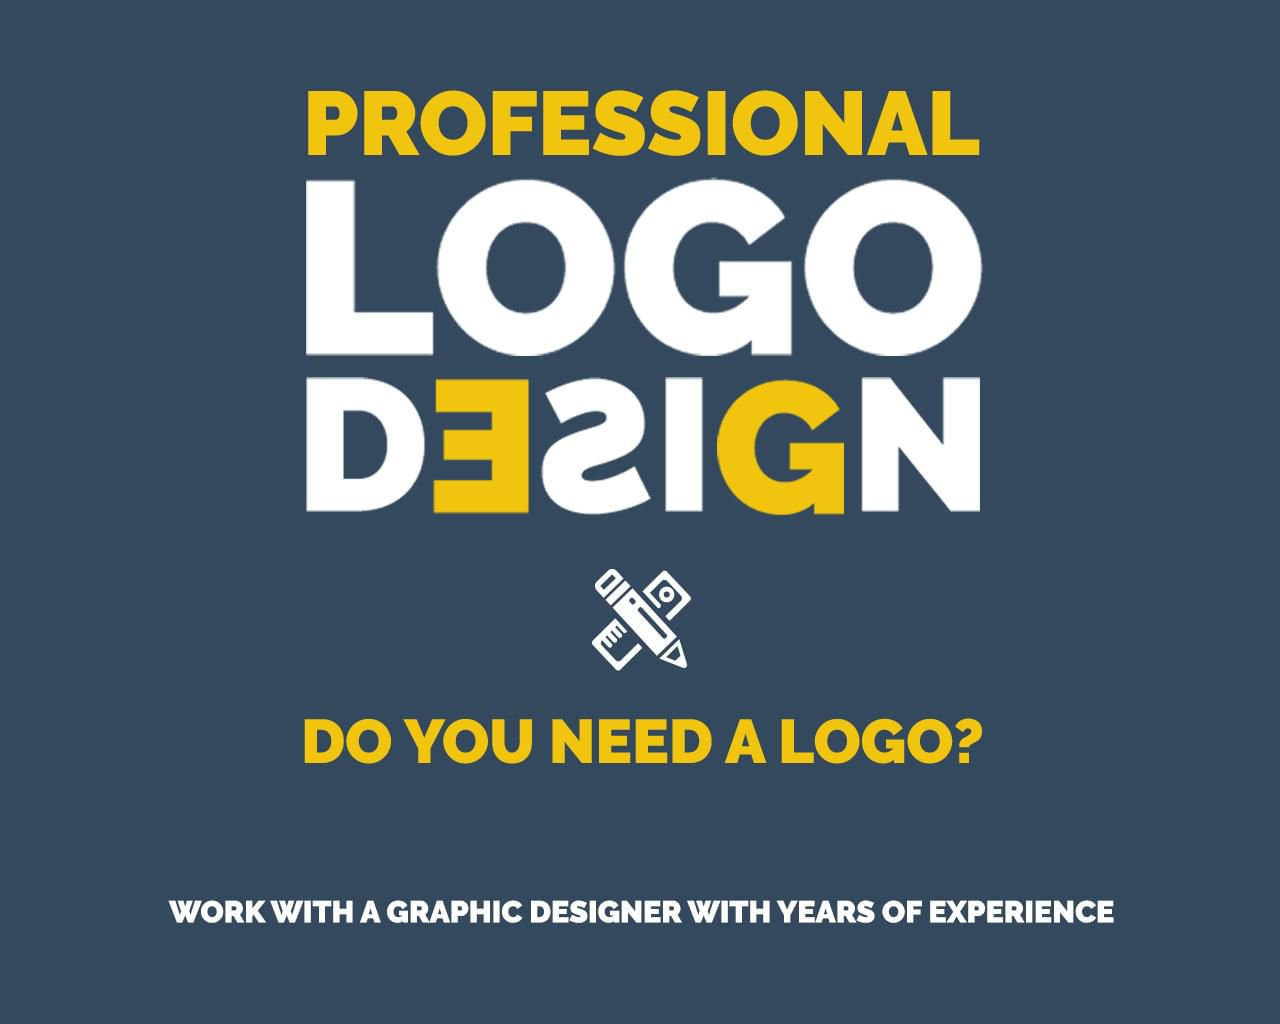 Superior Logo Design by Pirenko on Envato Studio